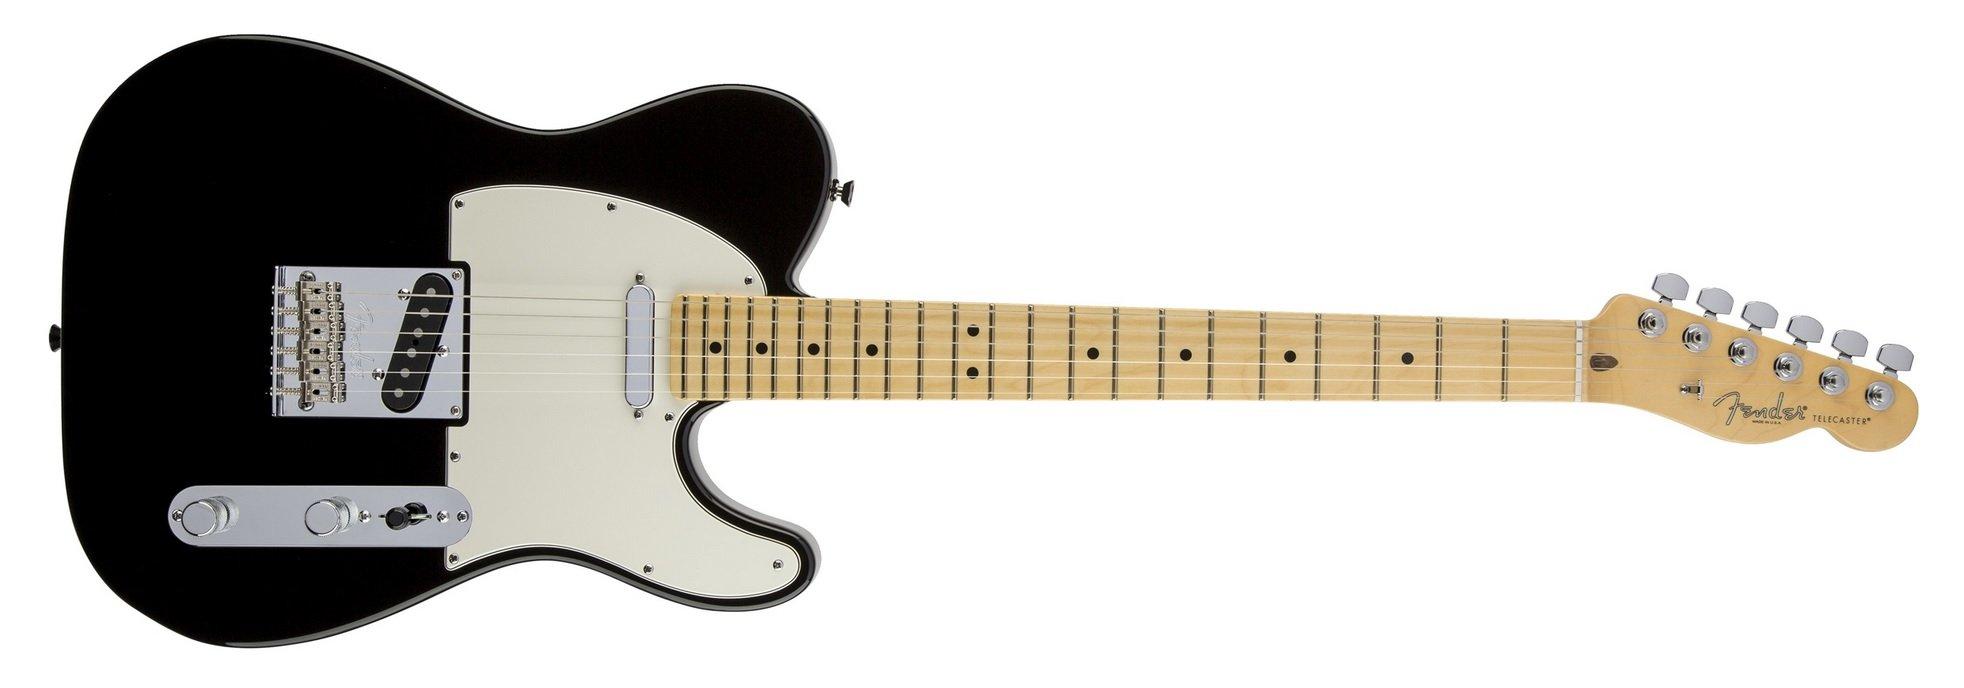 Fender American Standard Telecaster MN BLK